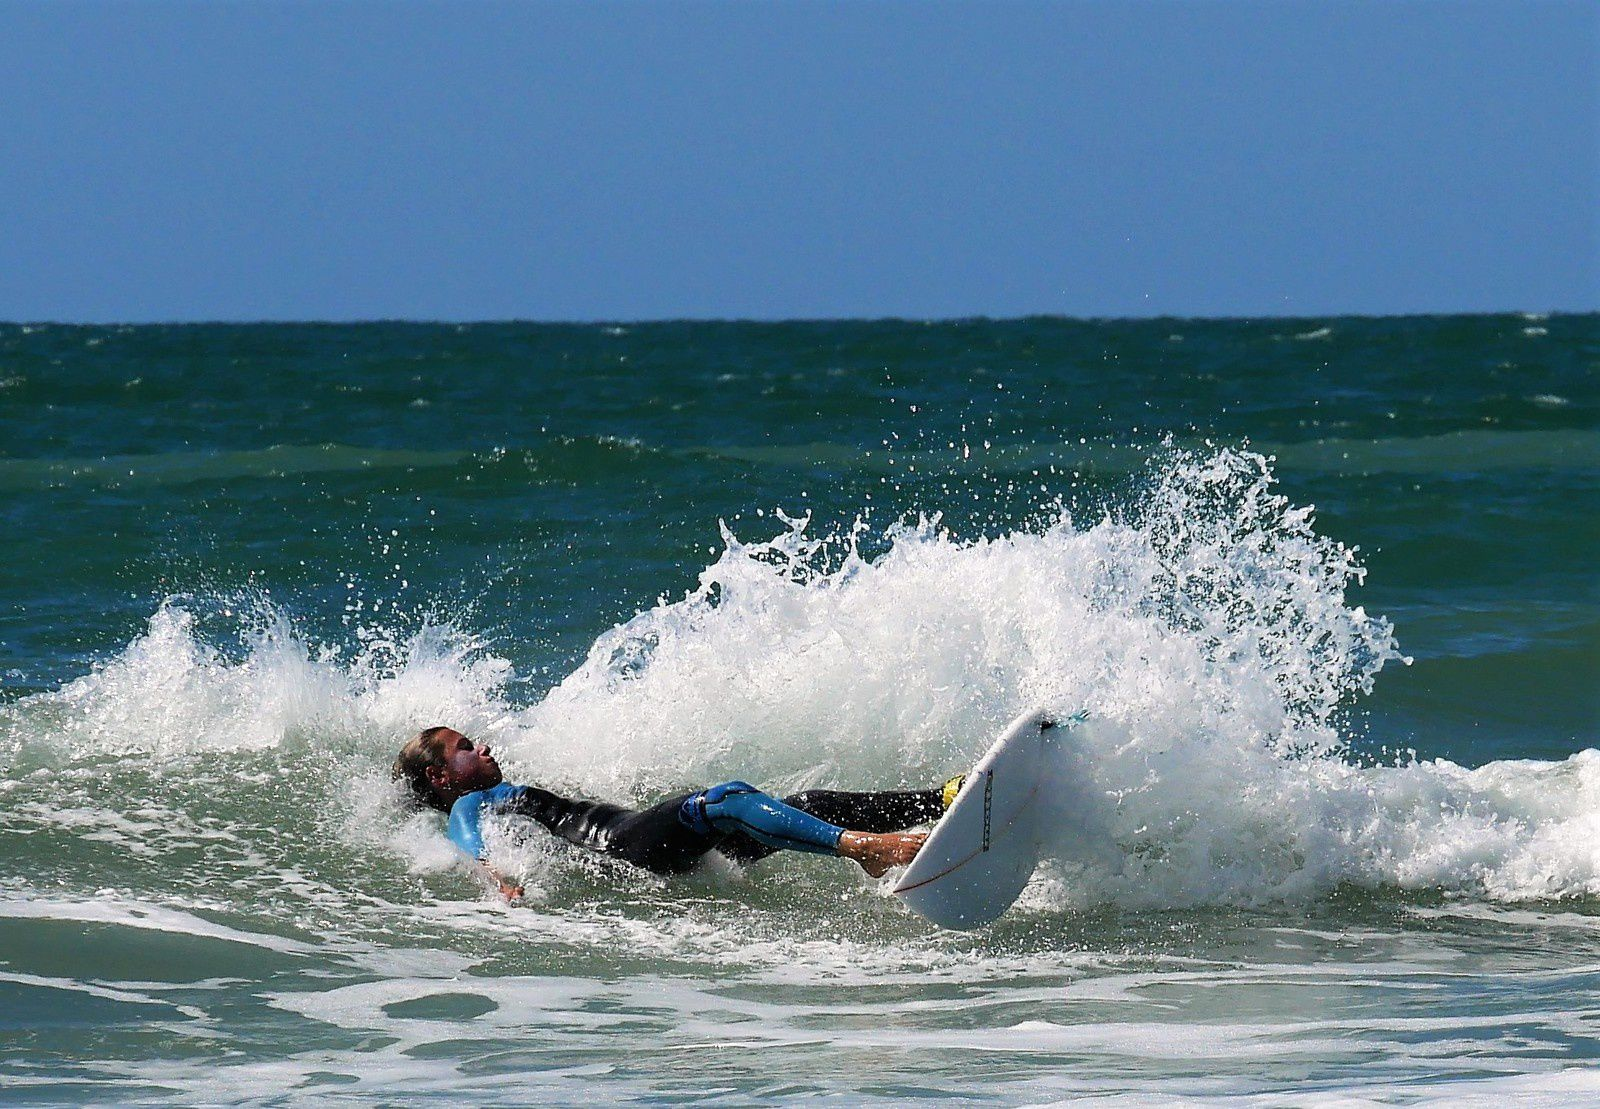 20 août Surf à l'horizontale!